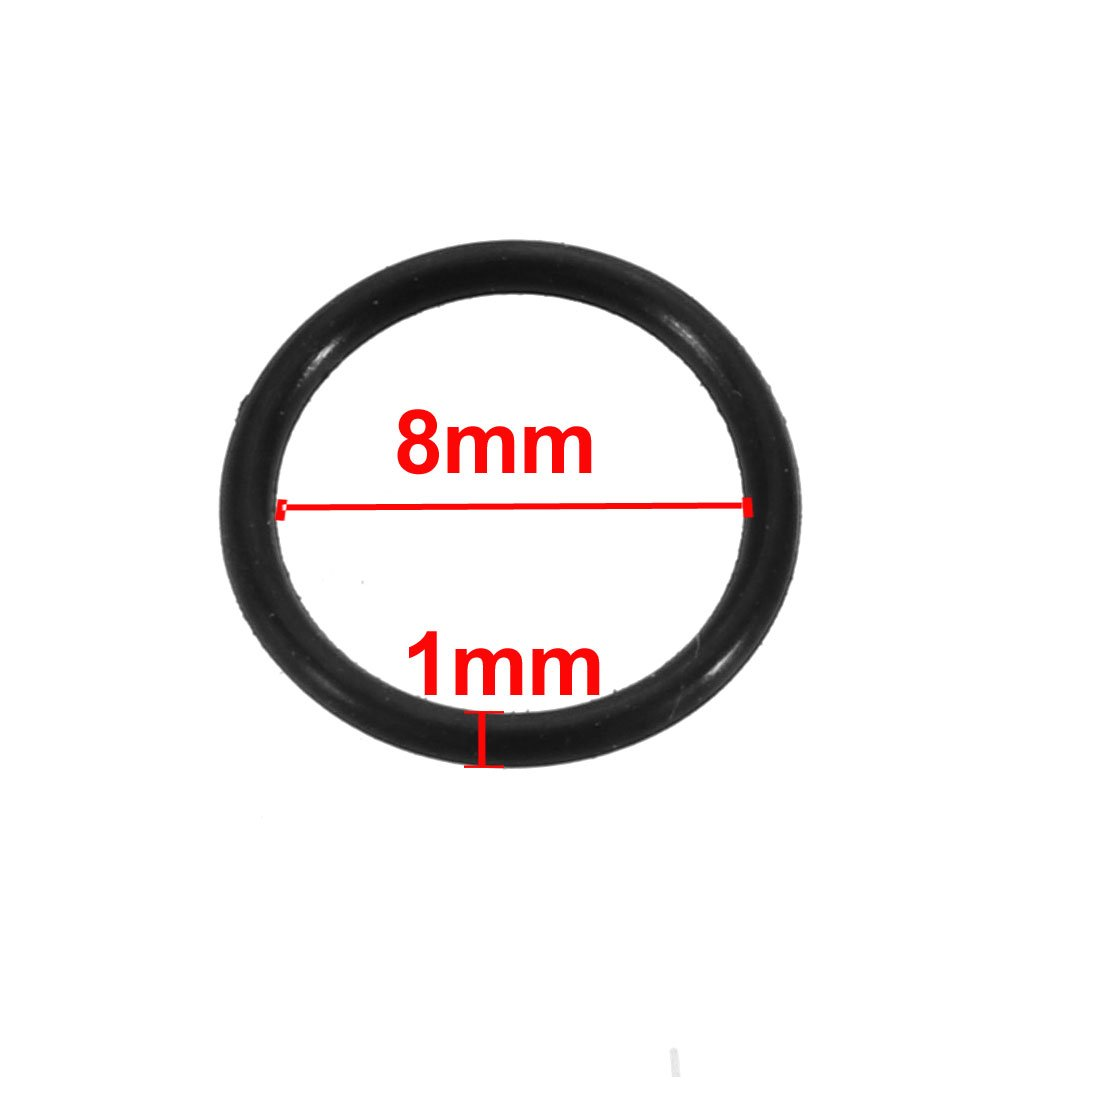 Nitril Butadien Kautschuk NBR O-Ring 8mm Innendurchmesser 1mm Schwarz de sourcing map 50stk